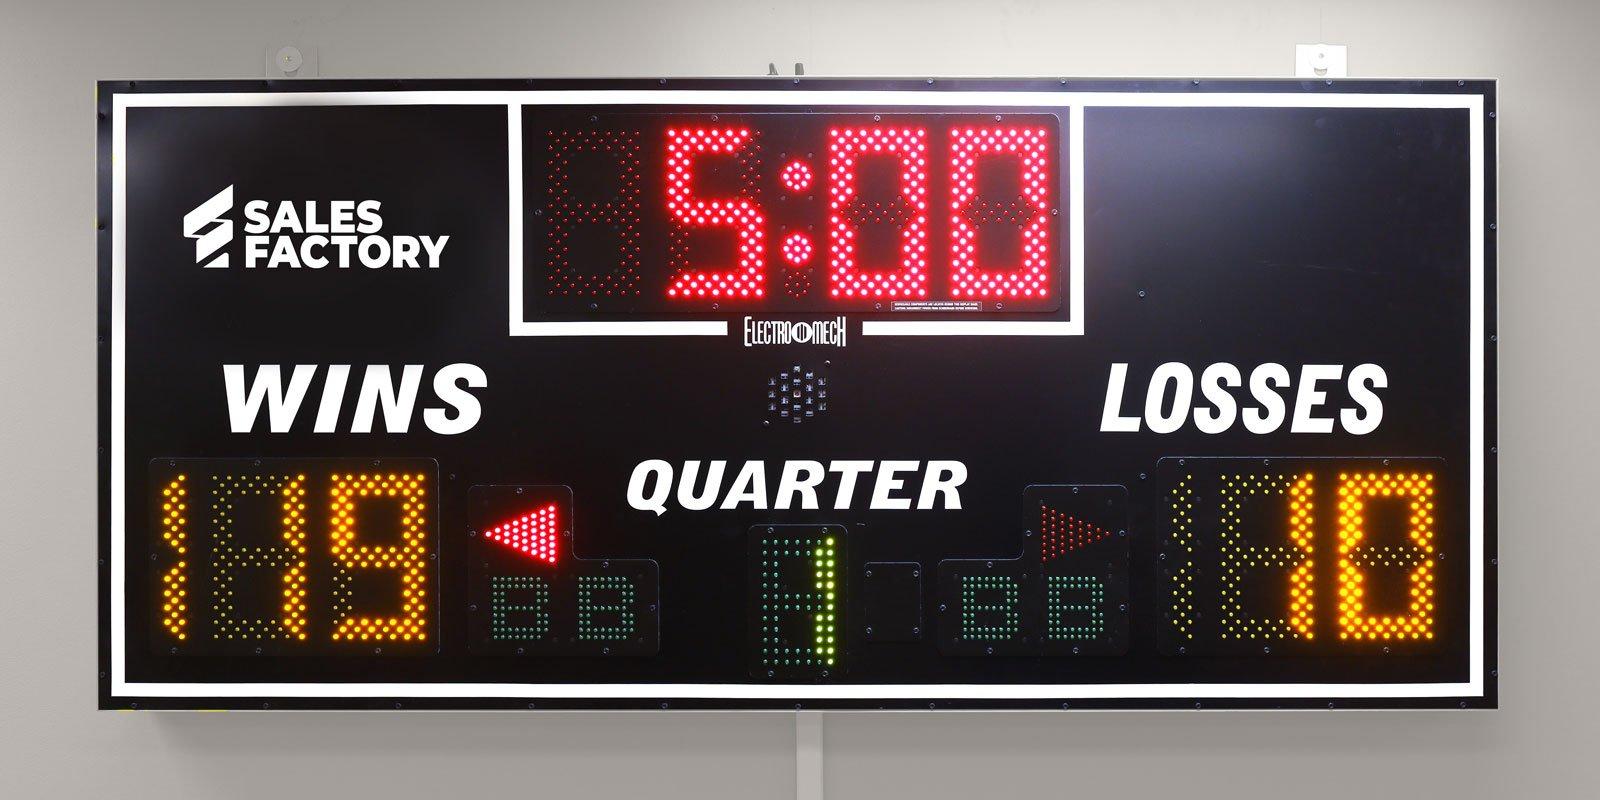 21-SFA-0119-Scoreboard-Image-V2-1